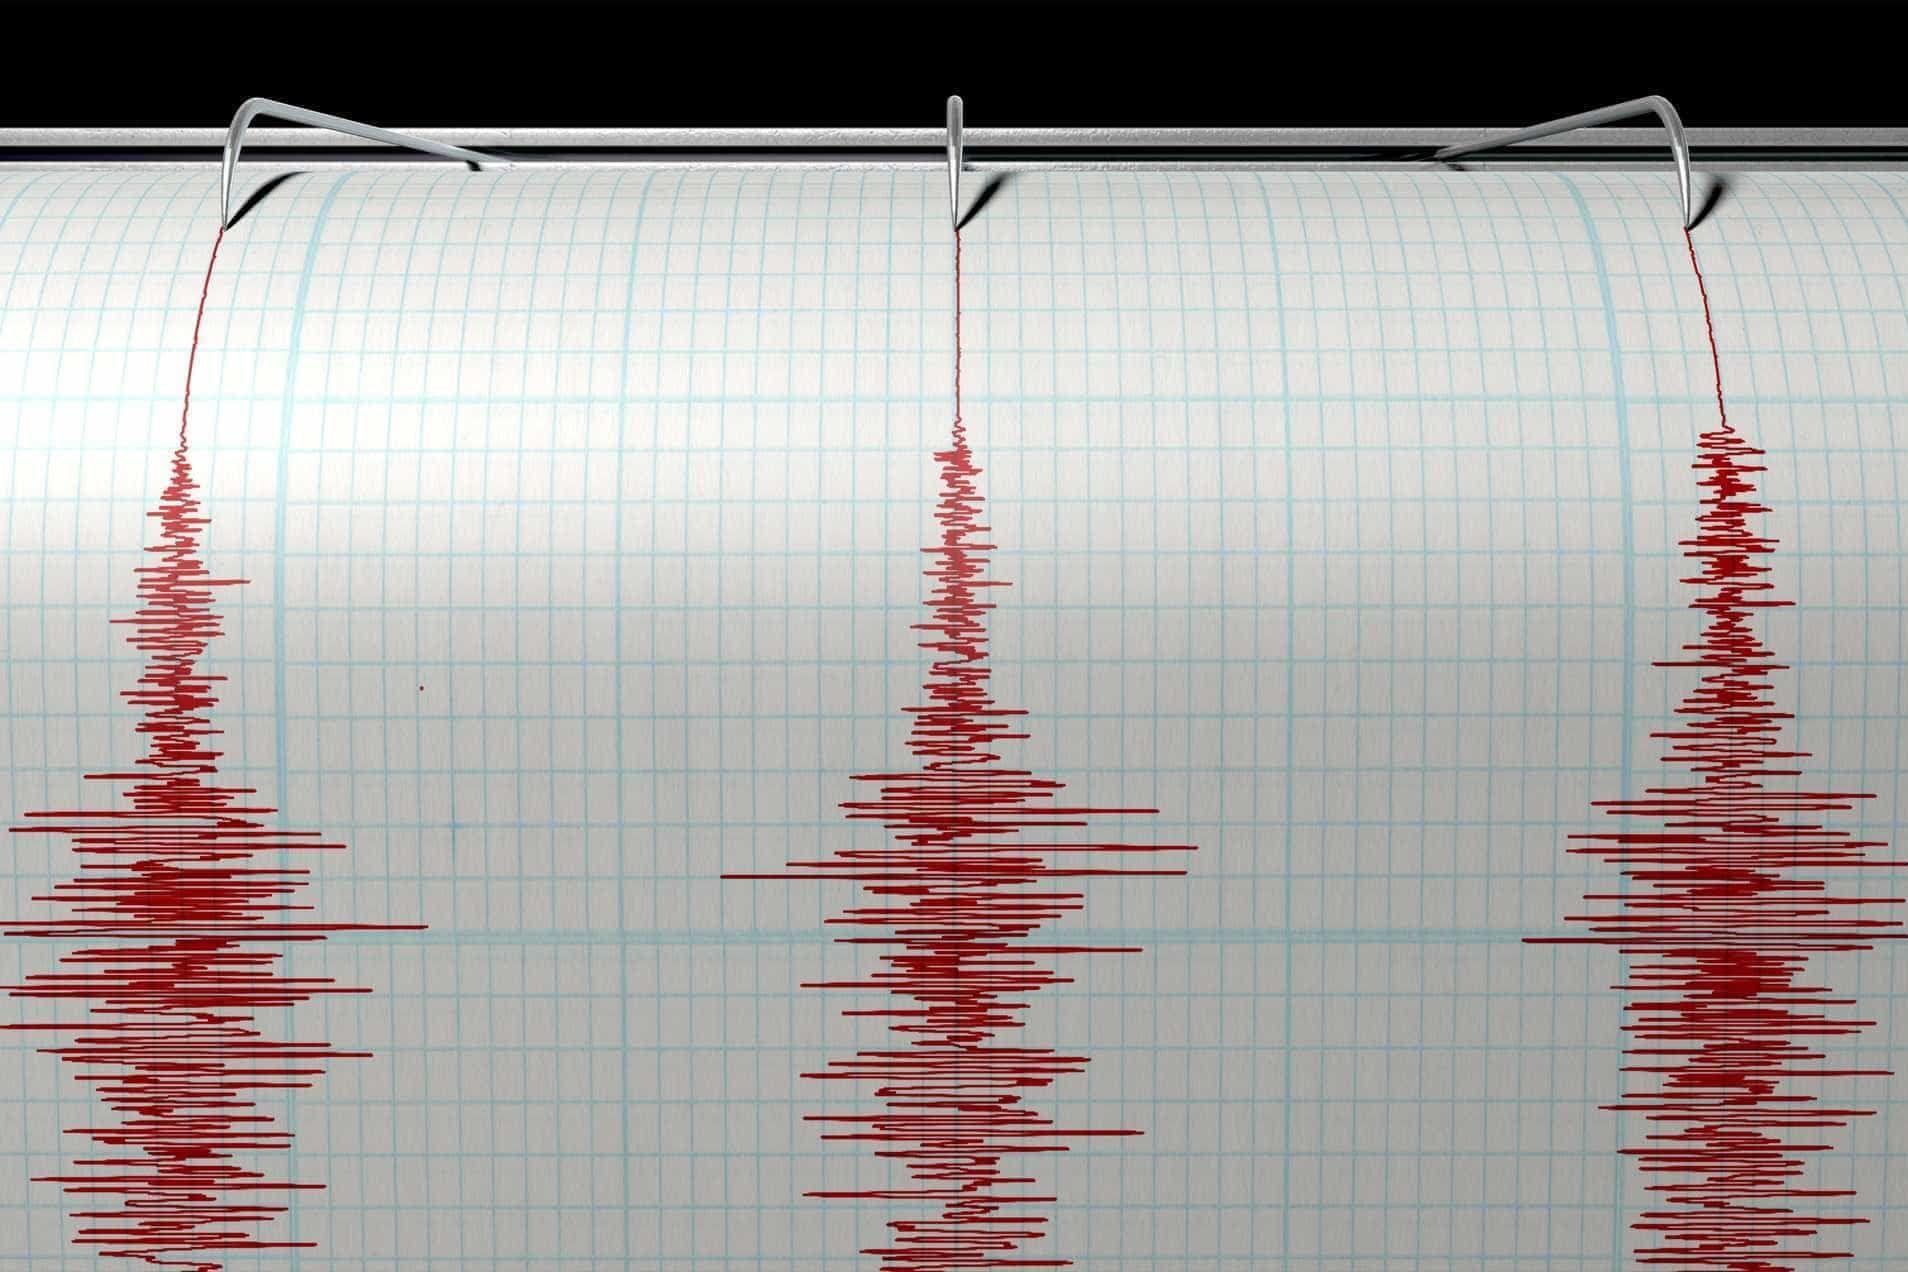 Terremoto de magnitude 6,3 atinge mar perto de Timor-Leste